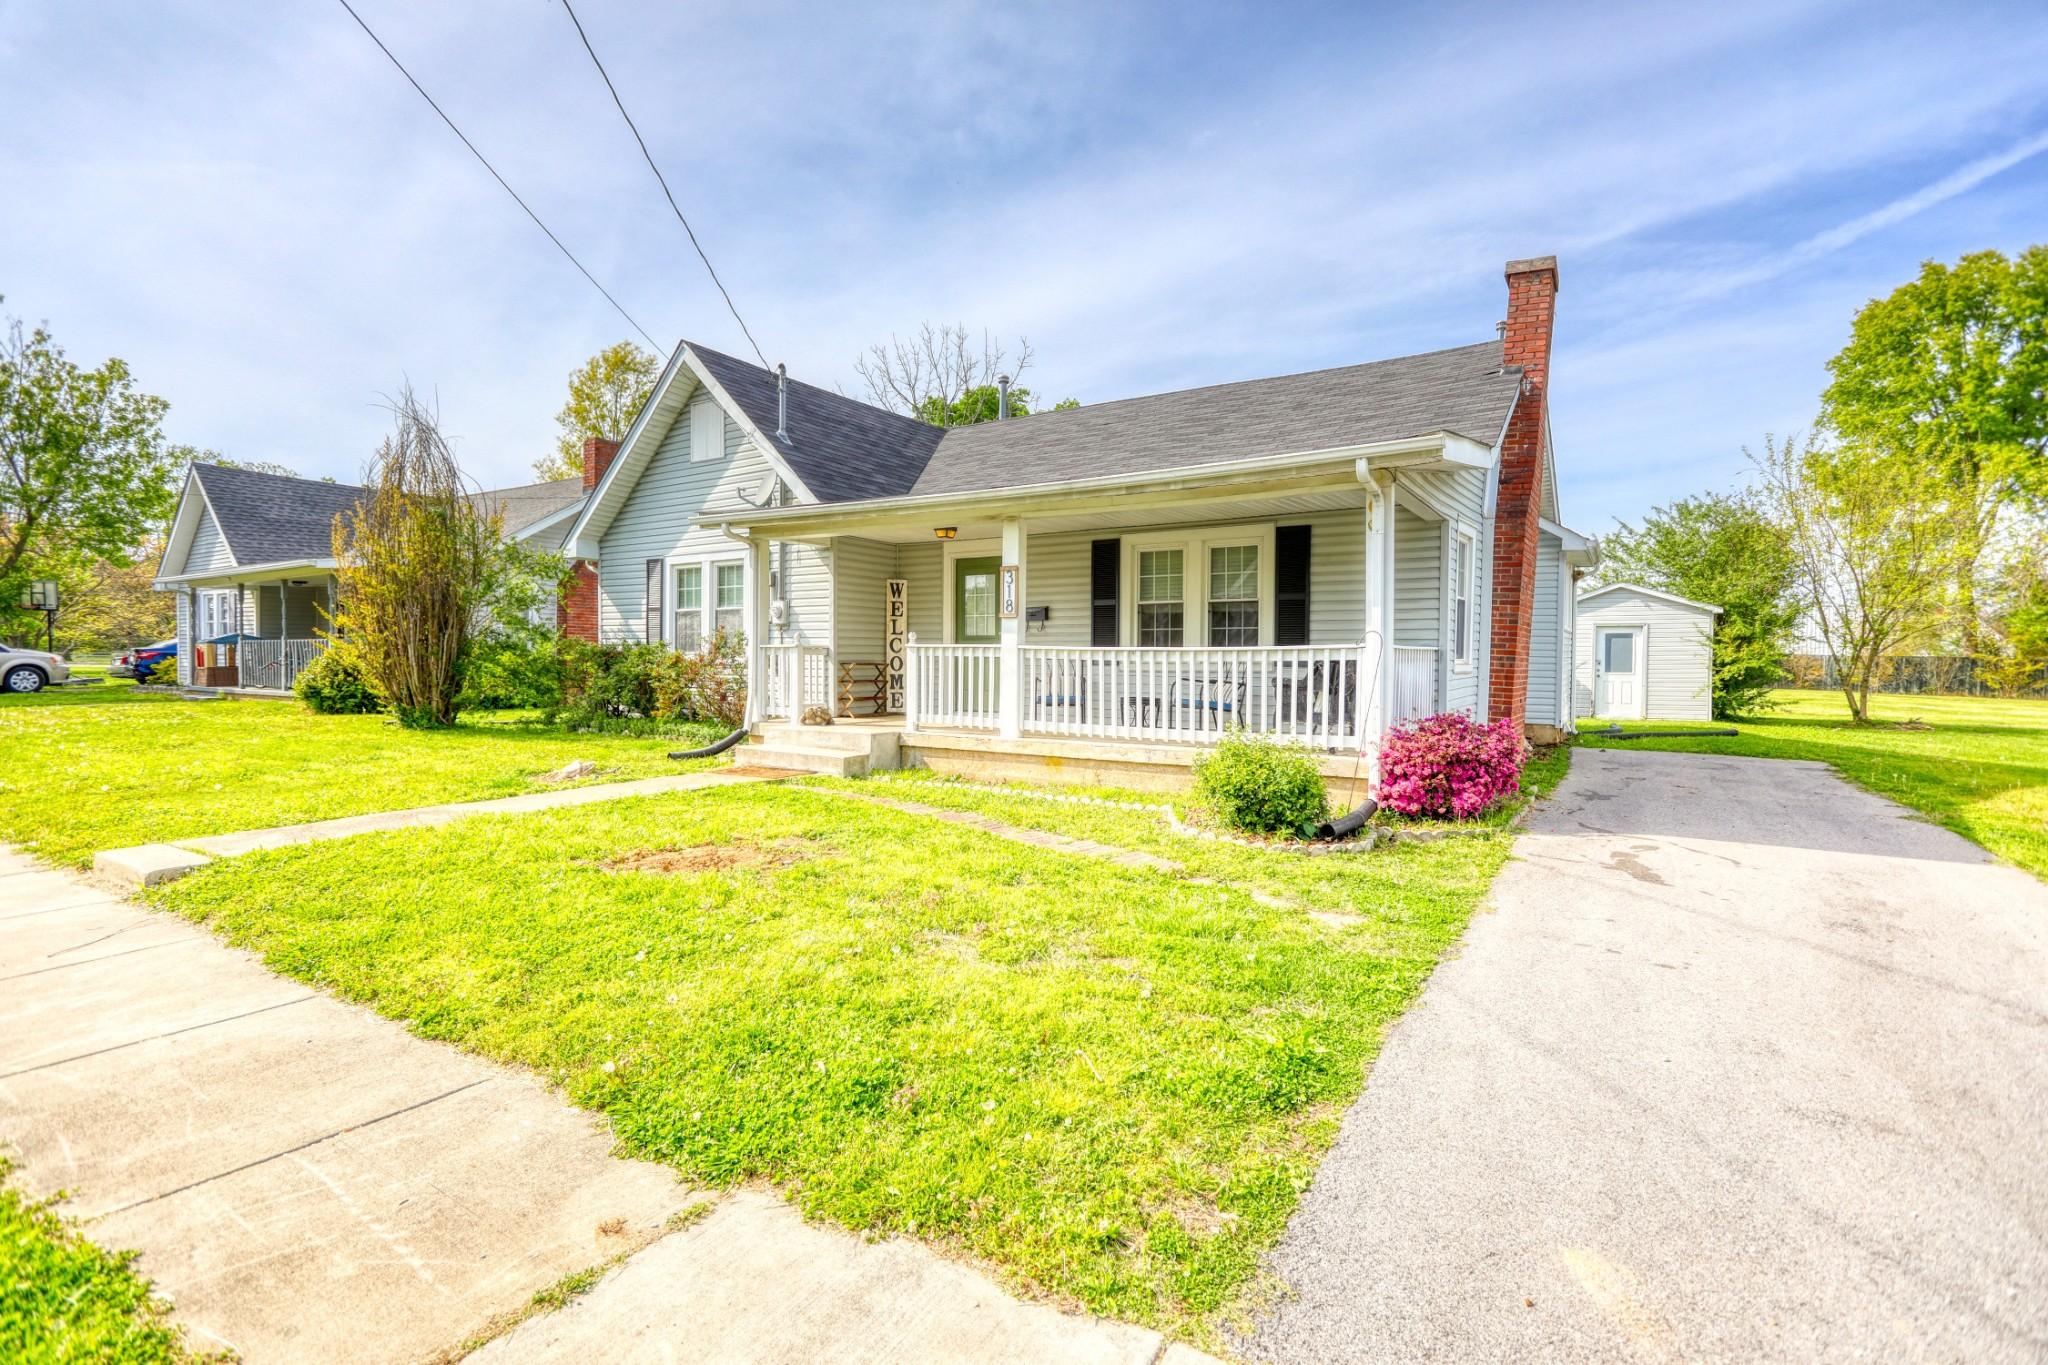 318 Montague St Property Photo - Franklin, KY real estate listing